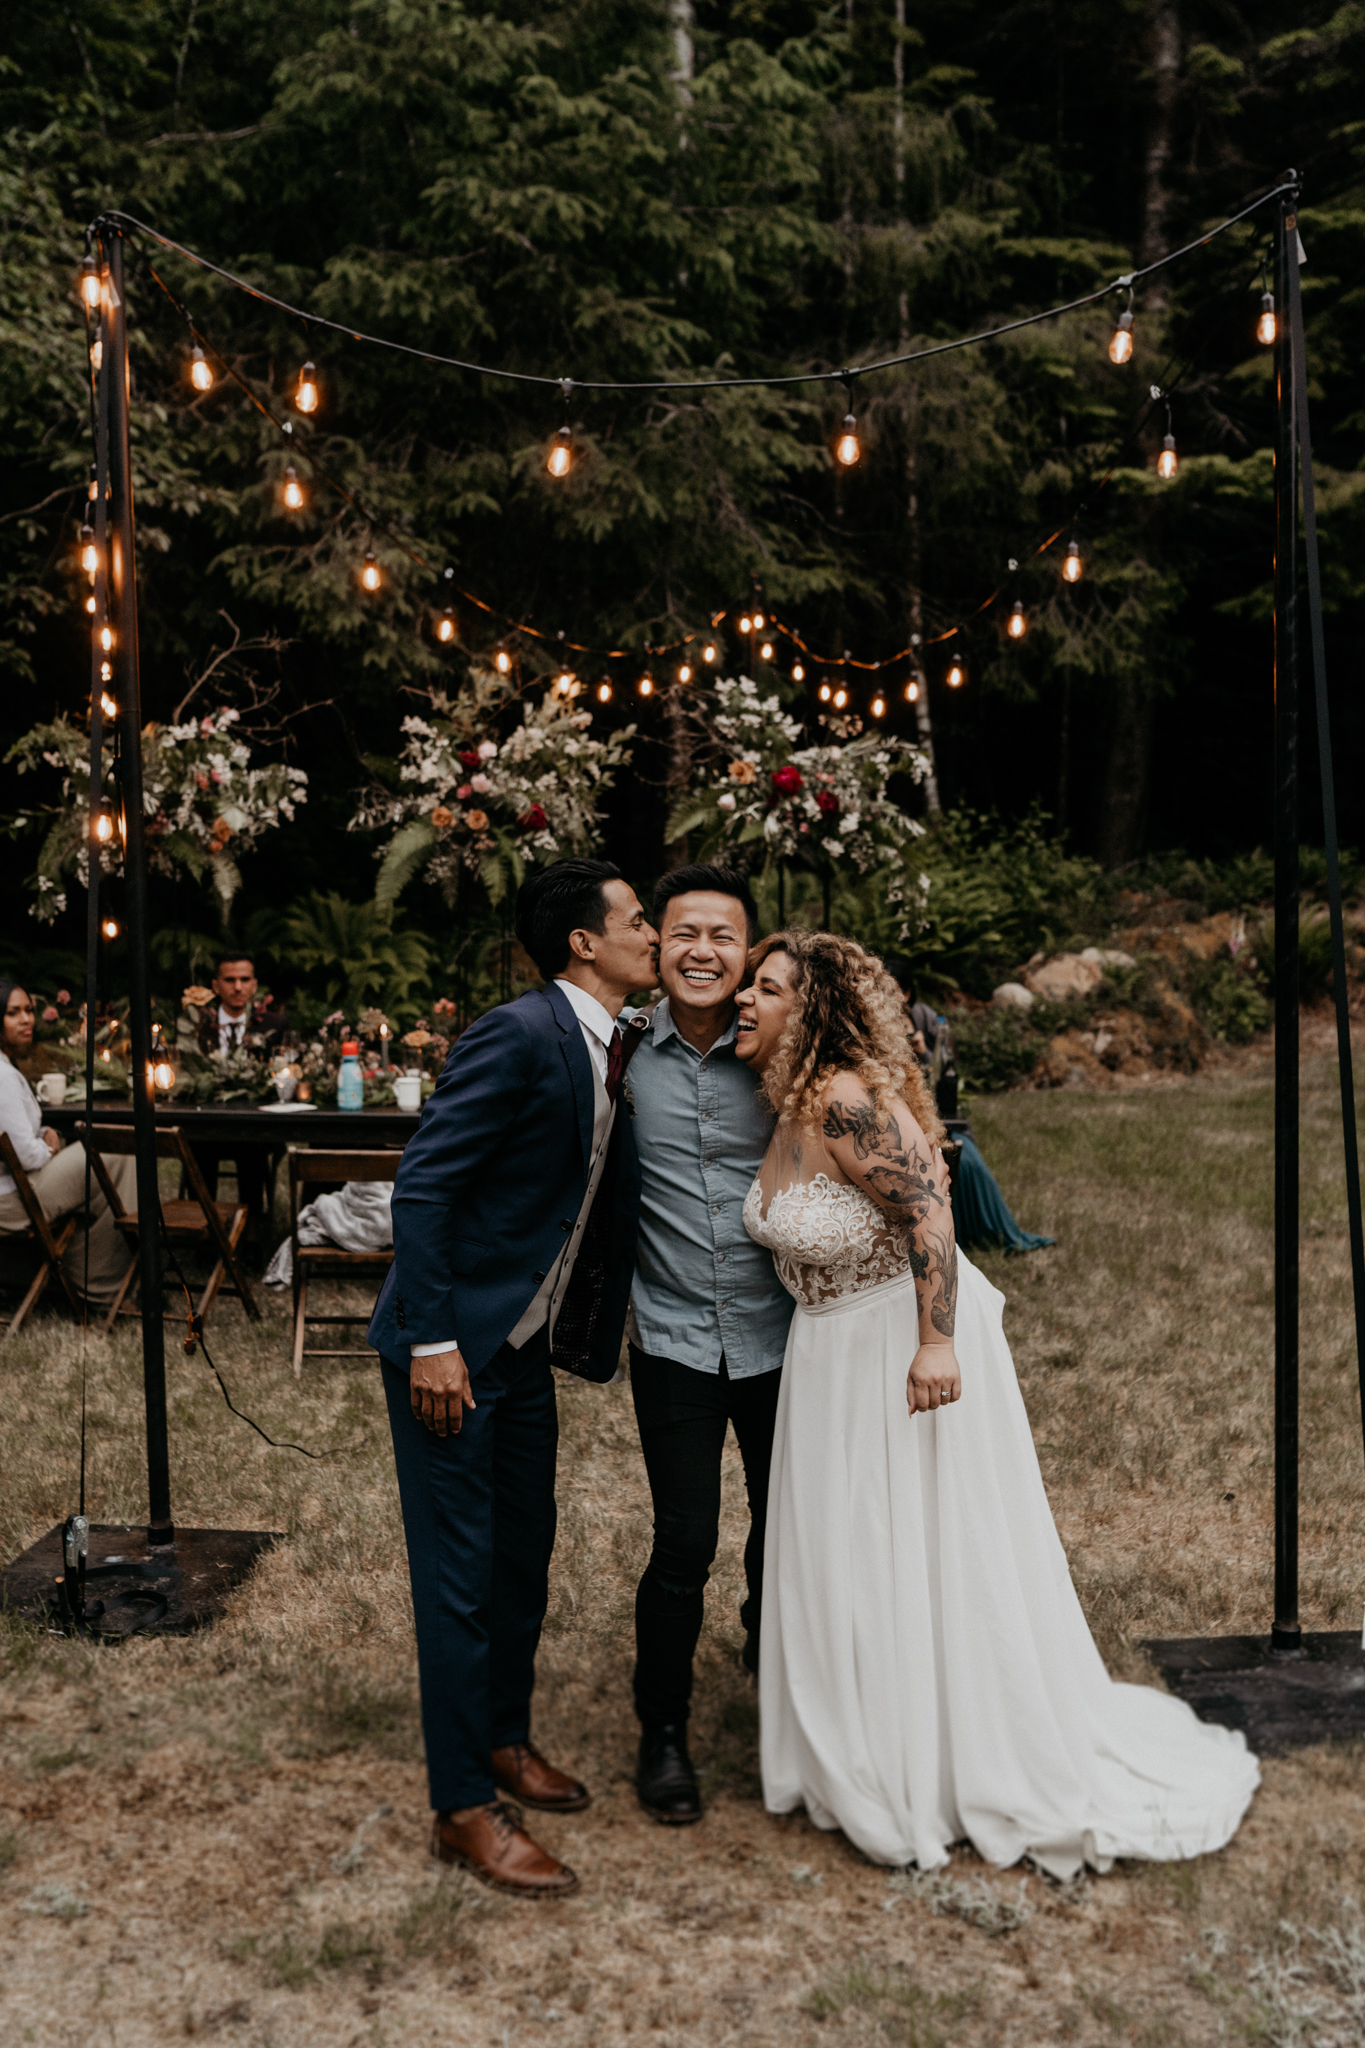 olympic-national-park-elopement-pnw-wedding-photographer-2.jpg